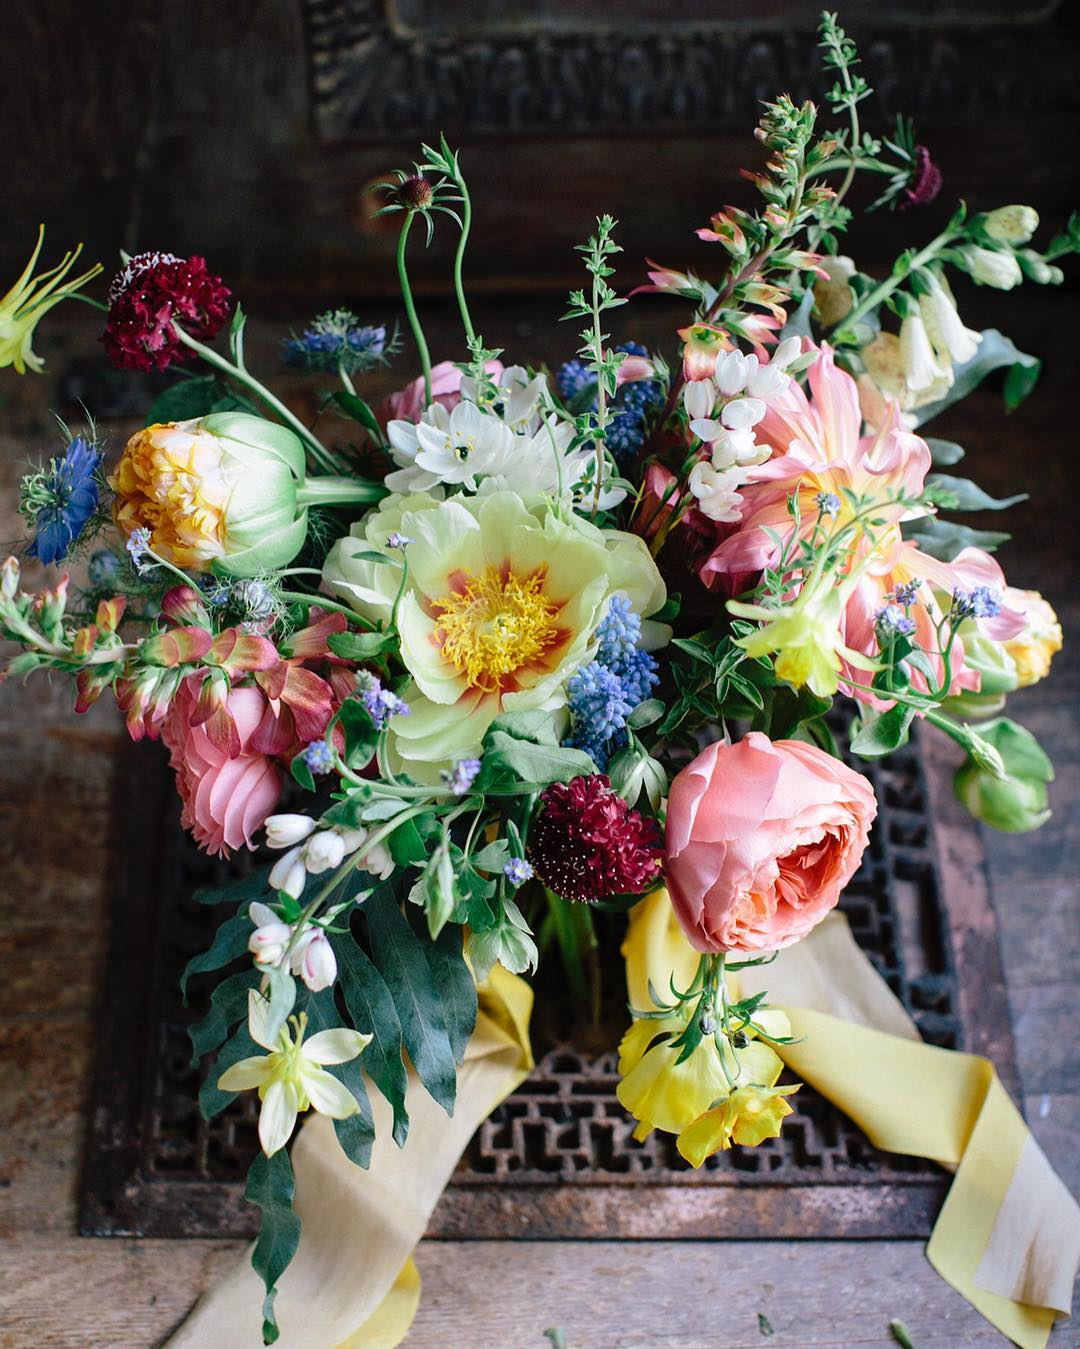 {still•life} photo | @kate_preftakes  styling/coordination | @eventsbysorrell . . #flowerart #gardenbouquet #englishgarden #prettyflowers #lush #pastels #stilllife #weddingdesign #lotusfloraldesigns #love